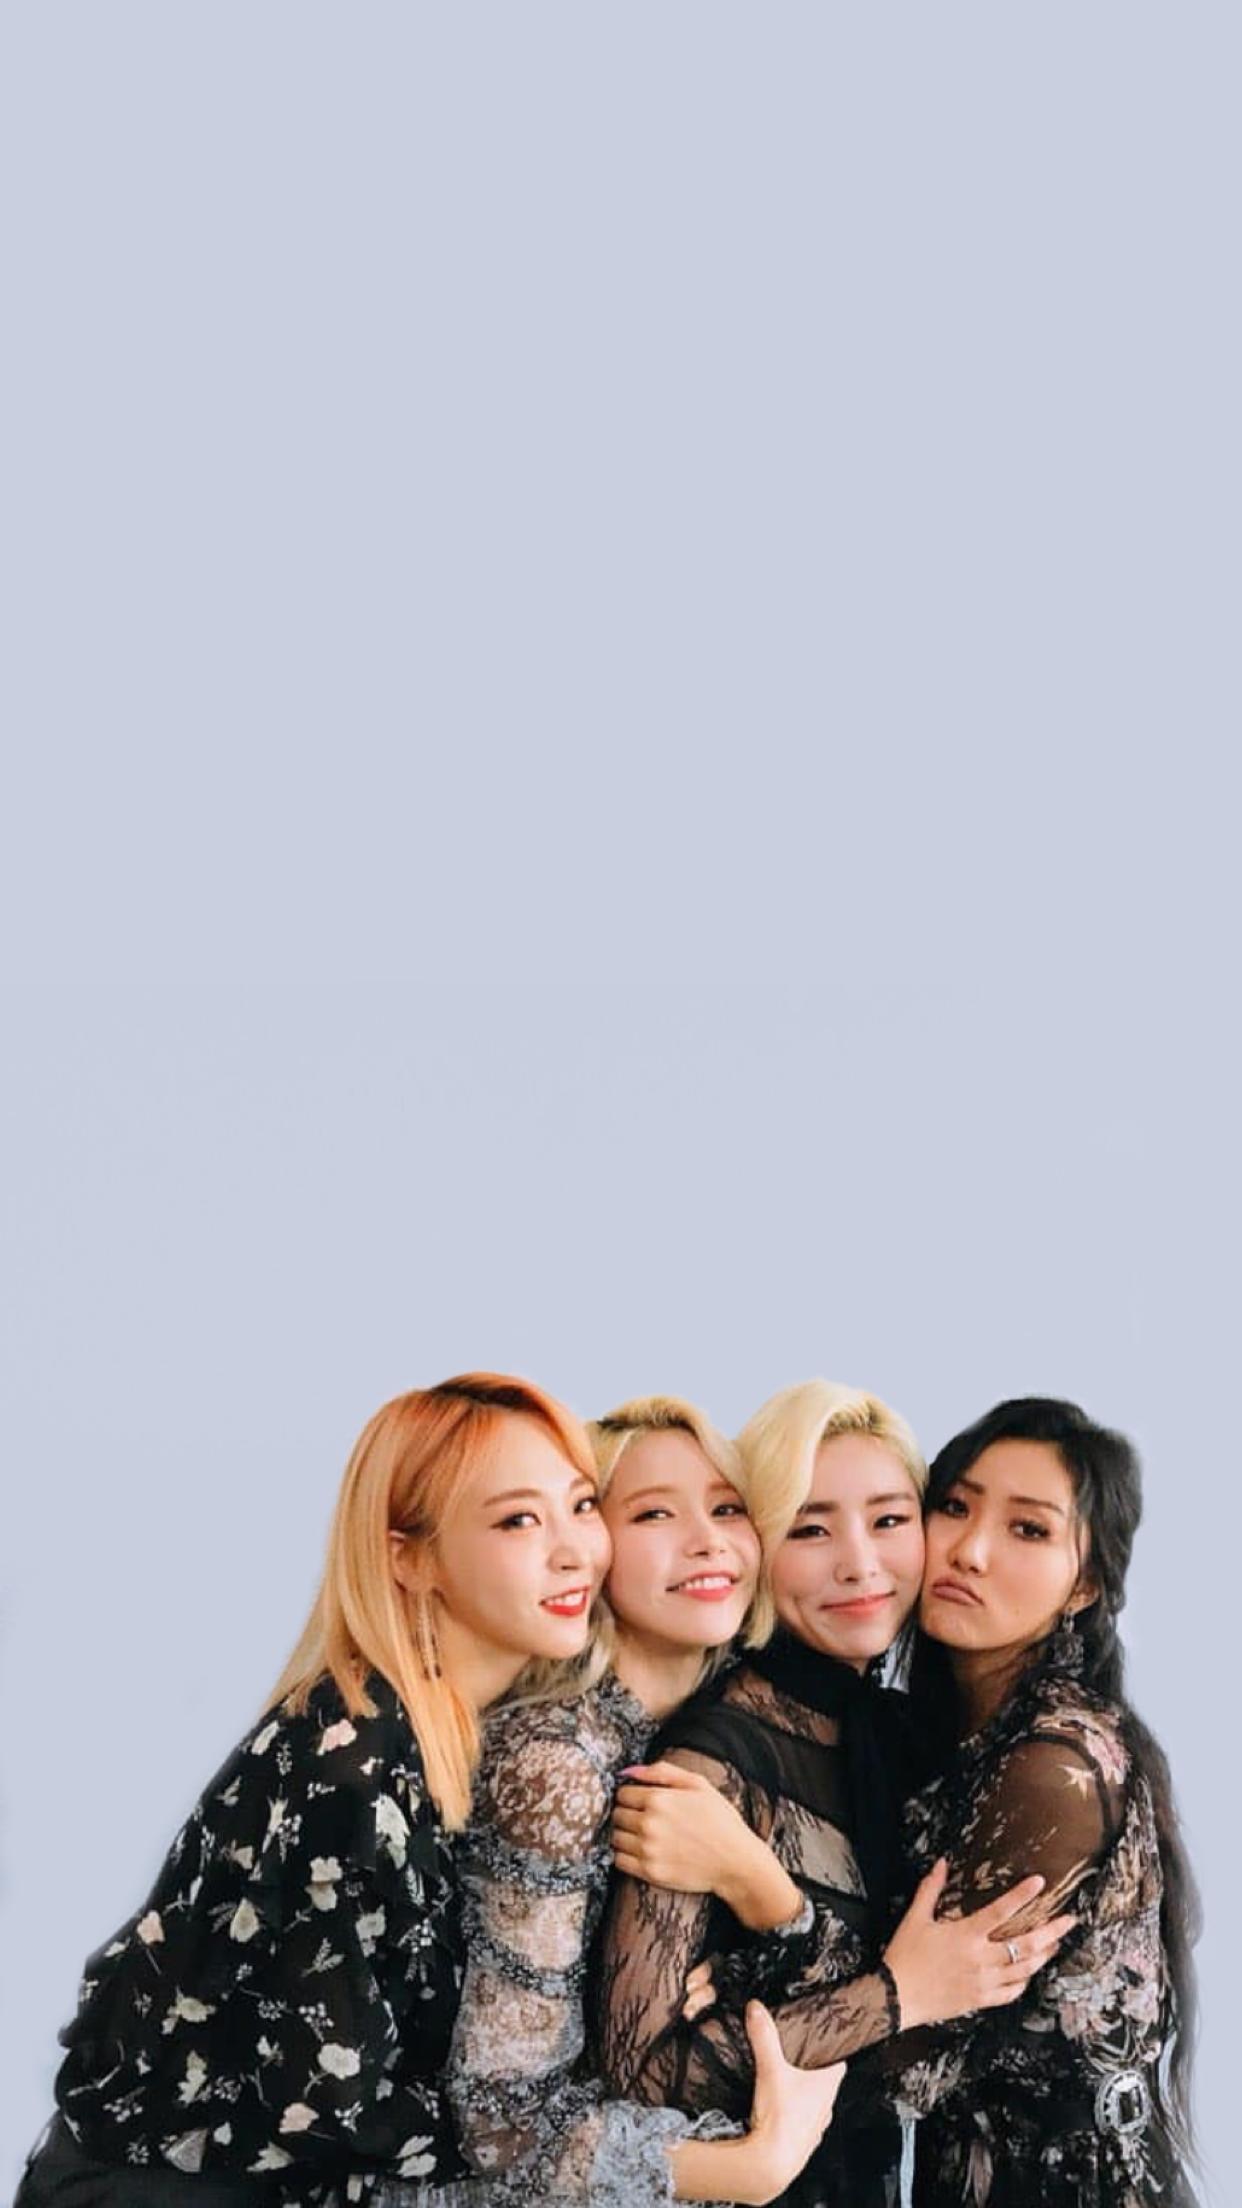 Top 10 Uprising K Pop Groups Solo Artists To Follow In 2020 Mamamoo Wheein Mamamoo Mamamoo Kpop